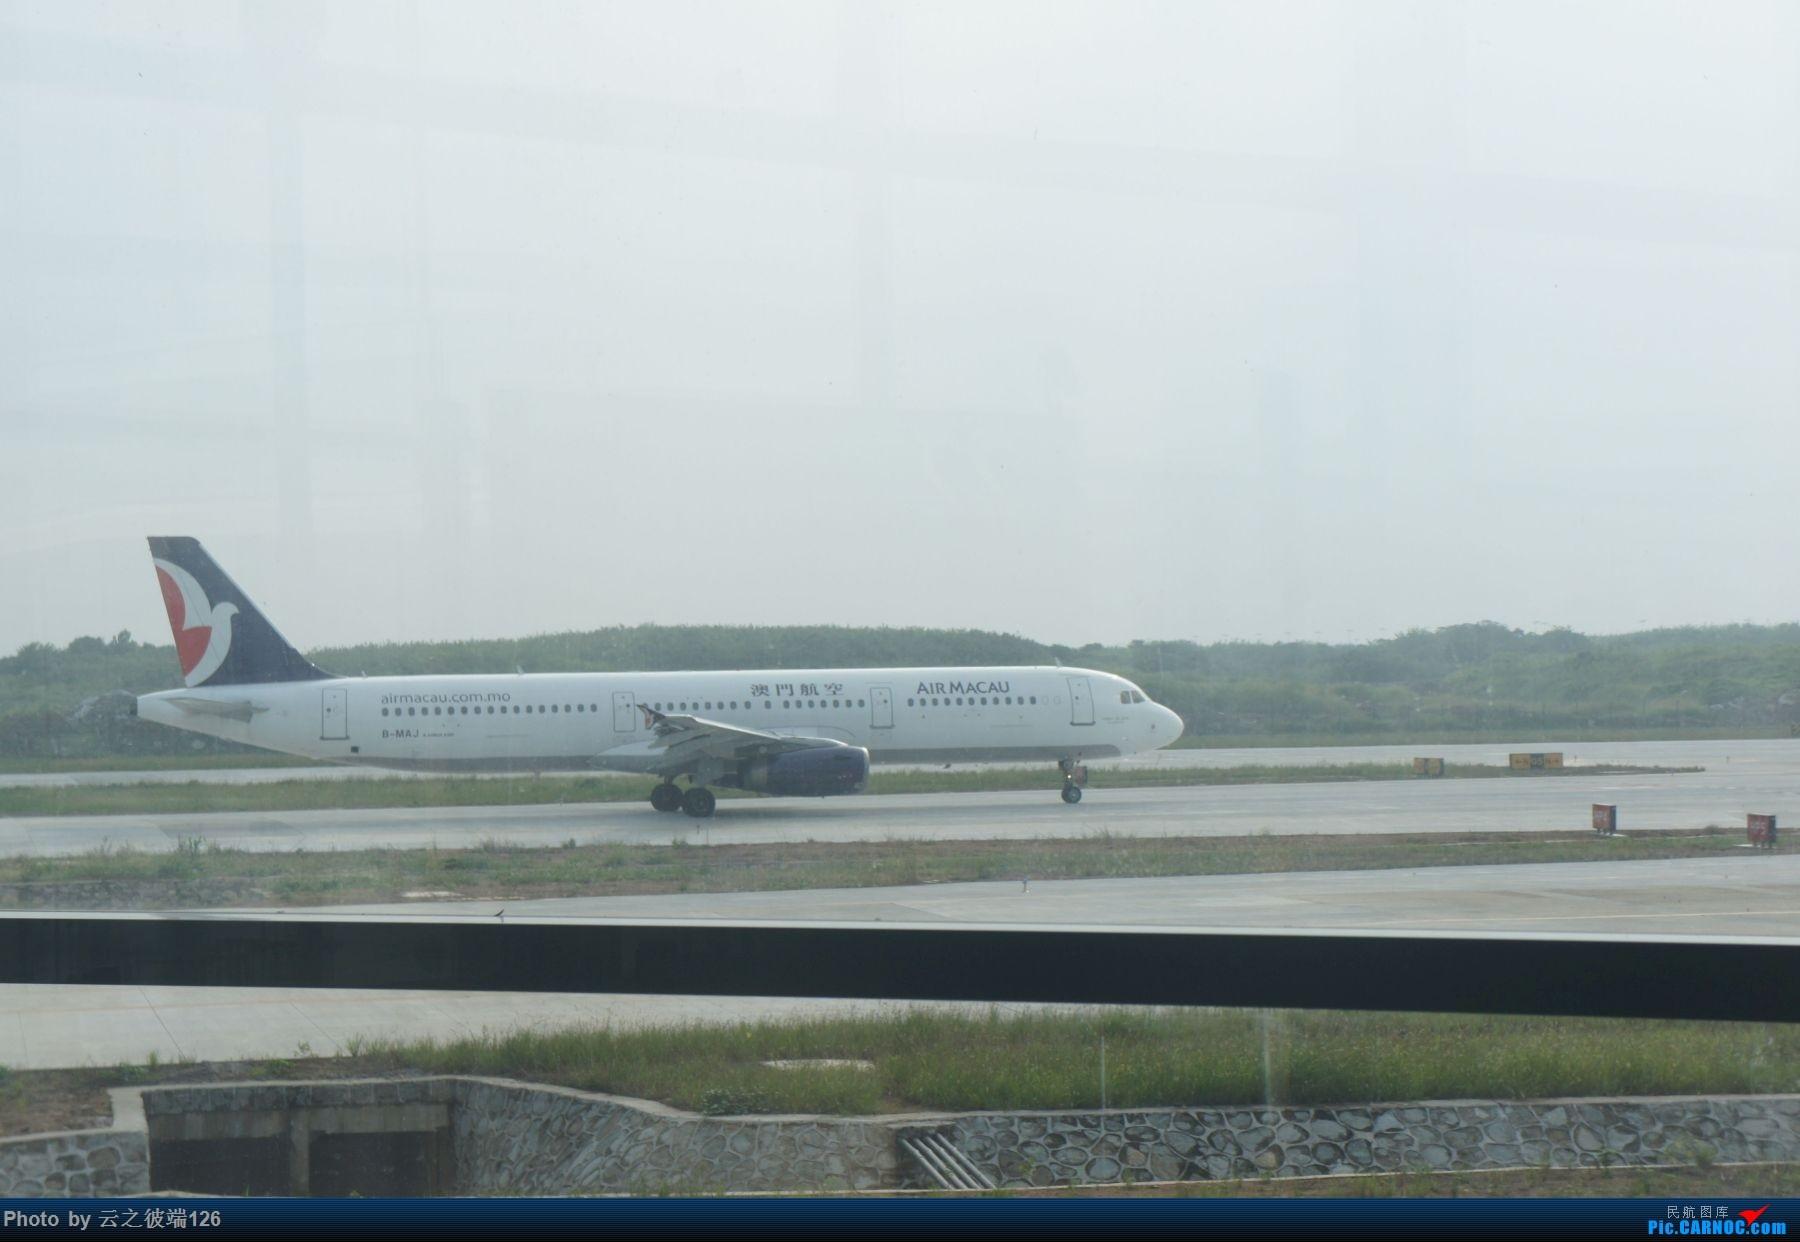 Re:[原创]迟到两年的游记 -----------NKG-SZX-NKG ZH+白菜航------ AIRBUS A321-200 B-MAJ 中国南京禄口国际机场